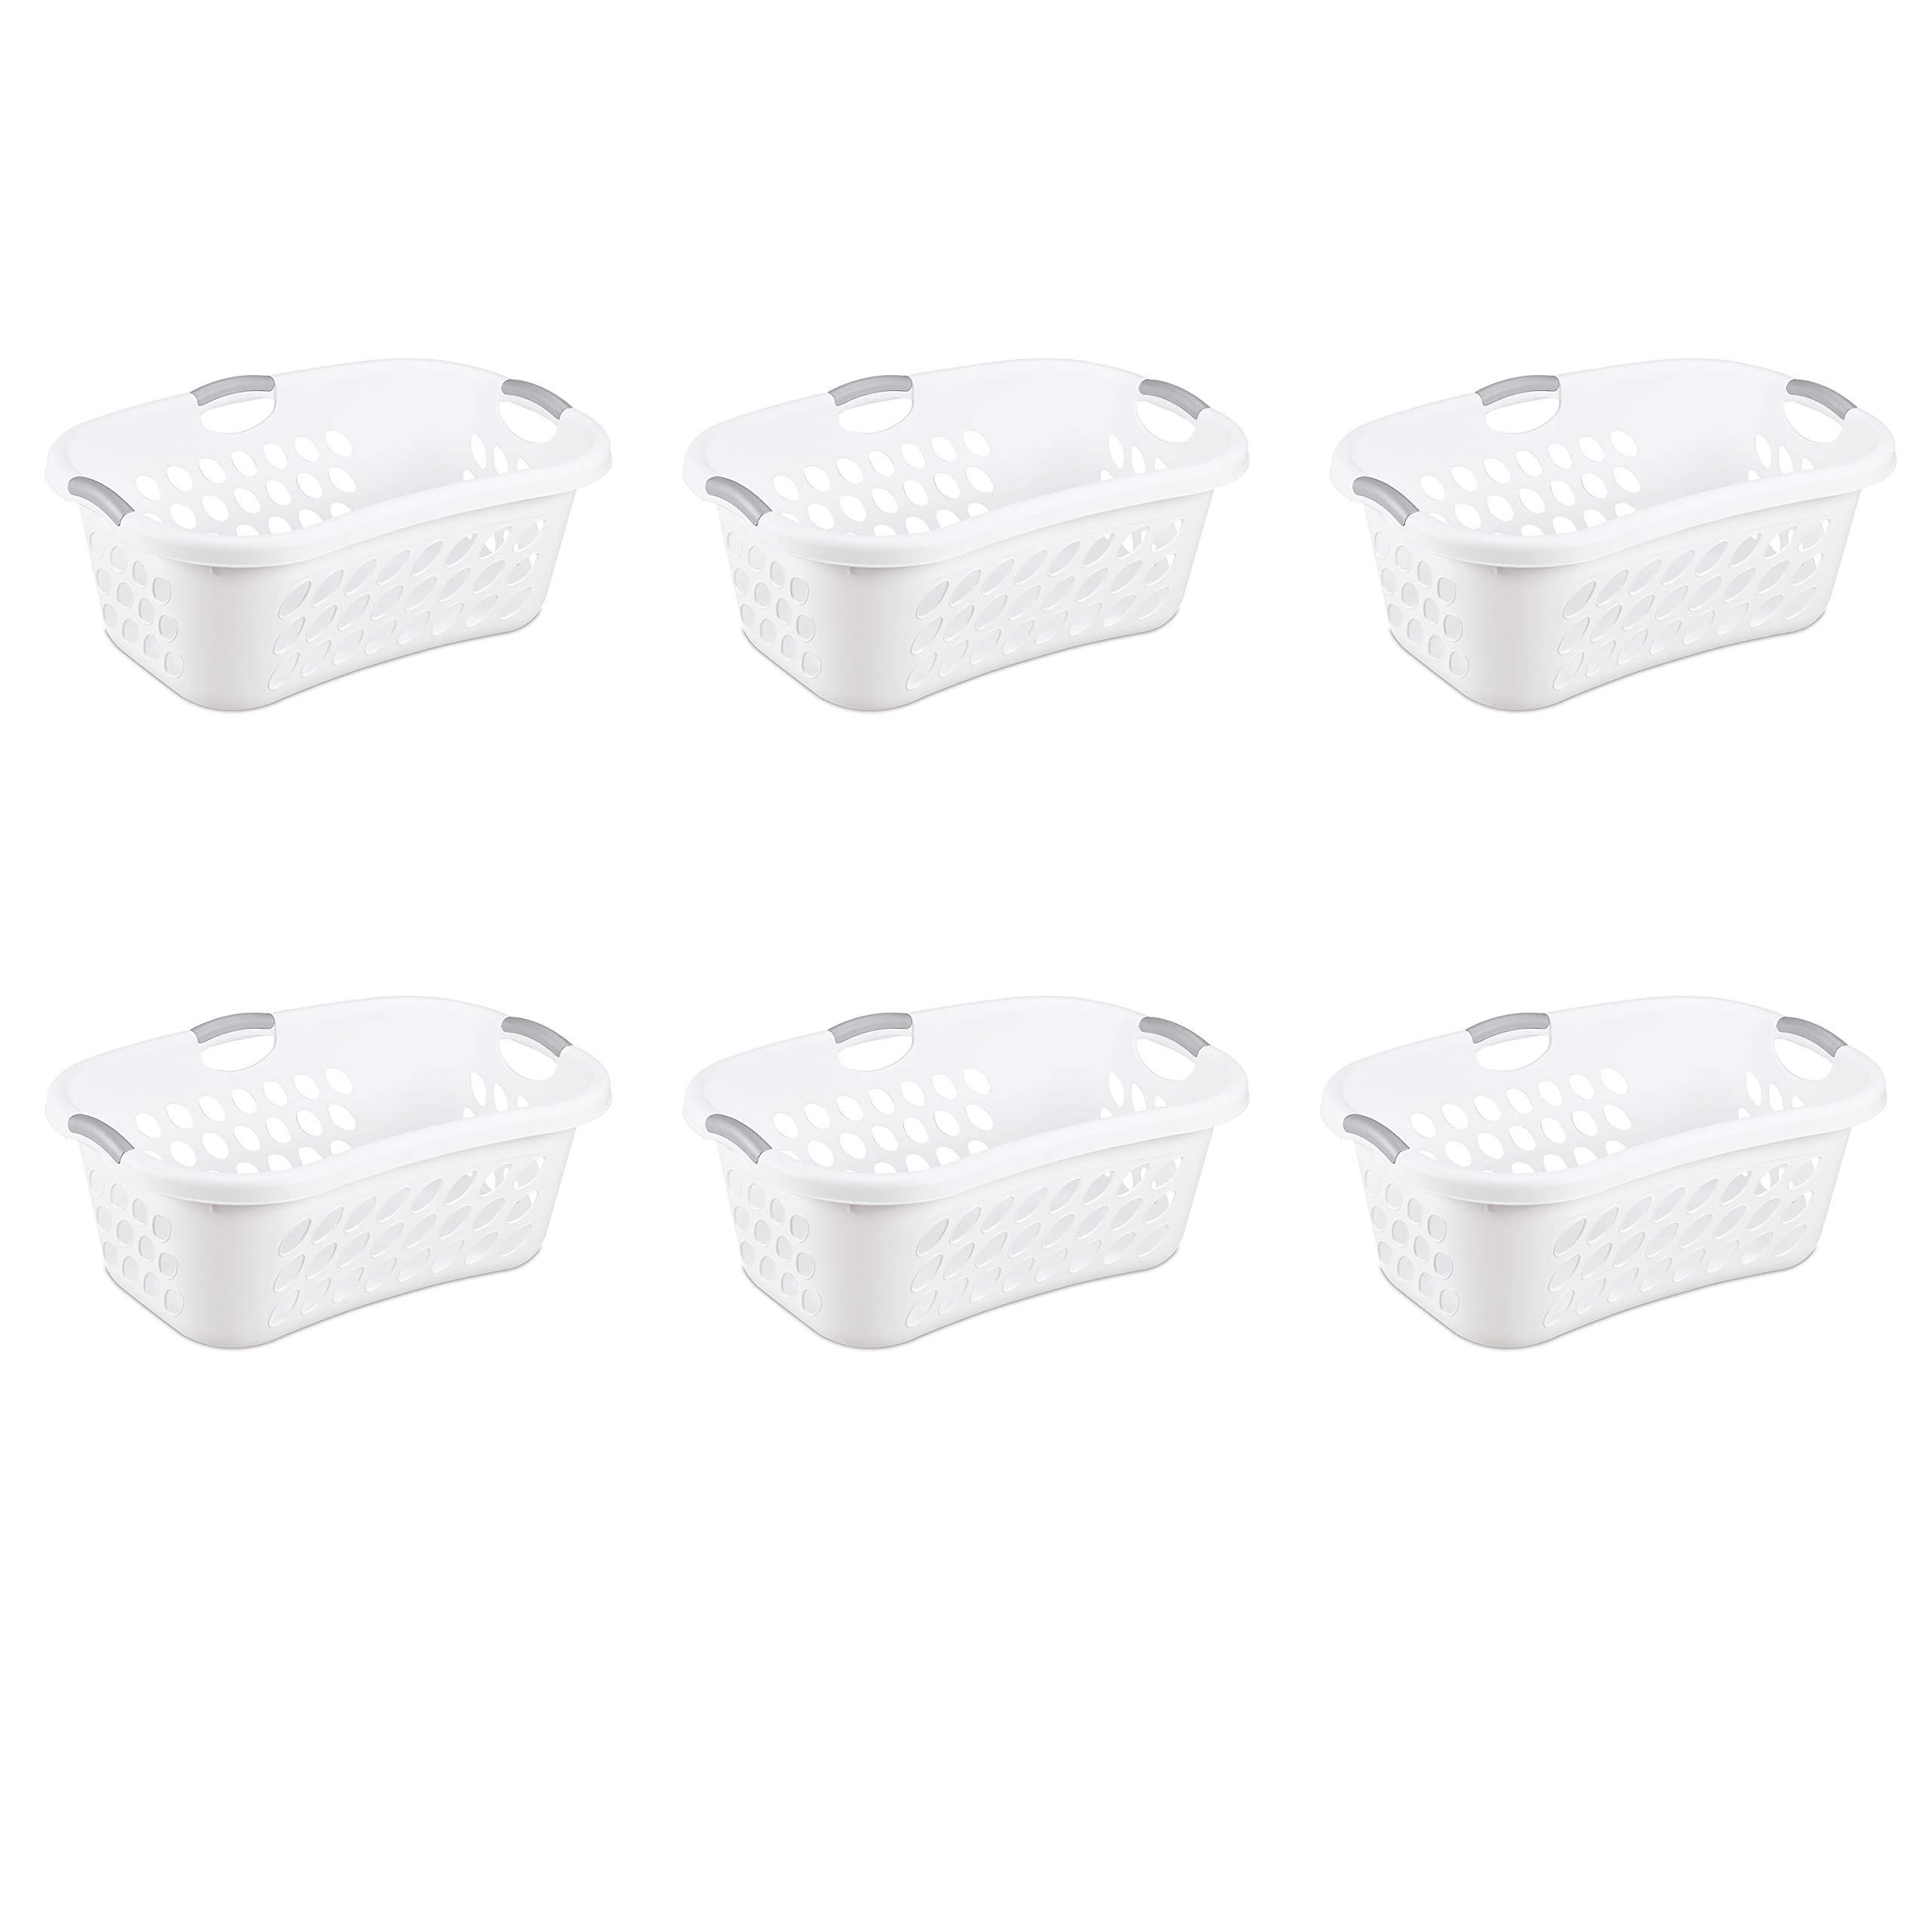 Sterilite 12108006 1.25 Bushel/44 Liter Ultra Hip Hold Laundry Basket, White Basket w/ Titanium Inserts, 6-Pack by STERILITE